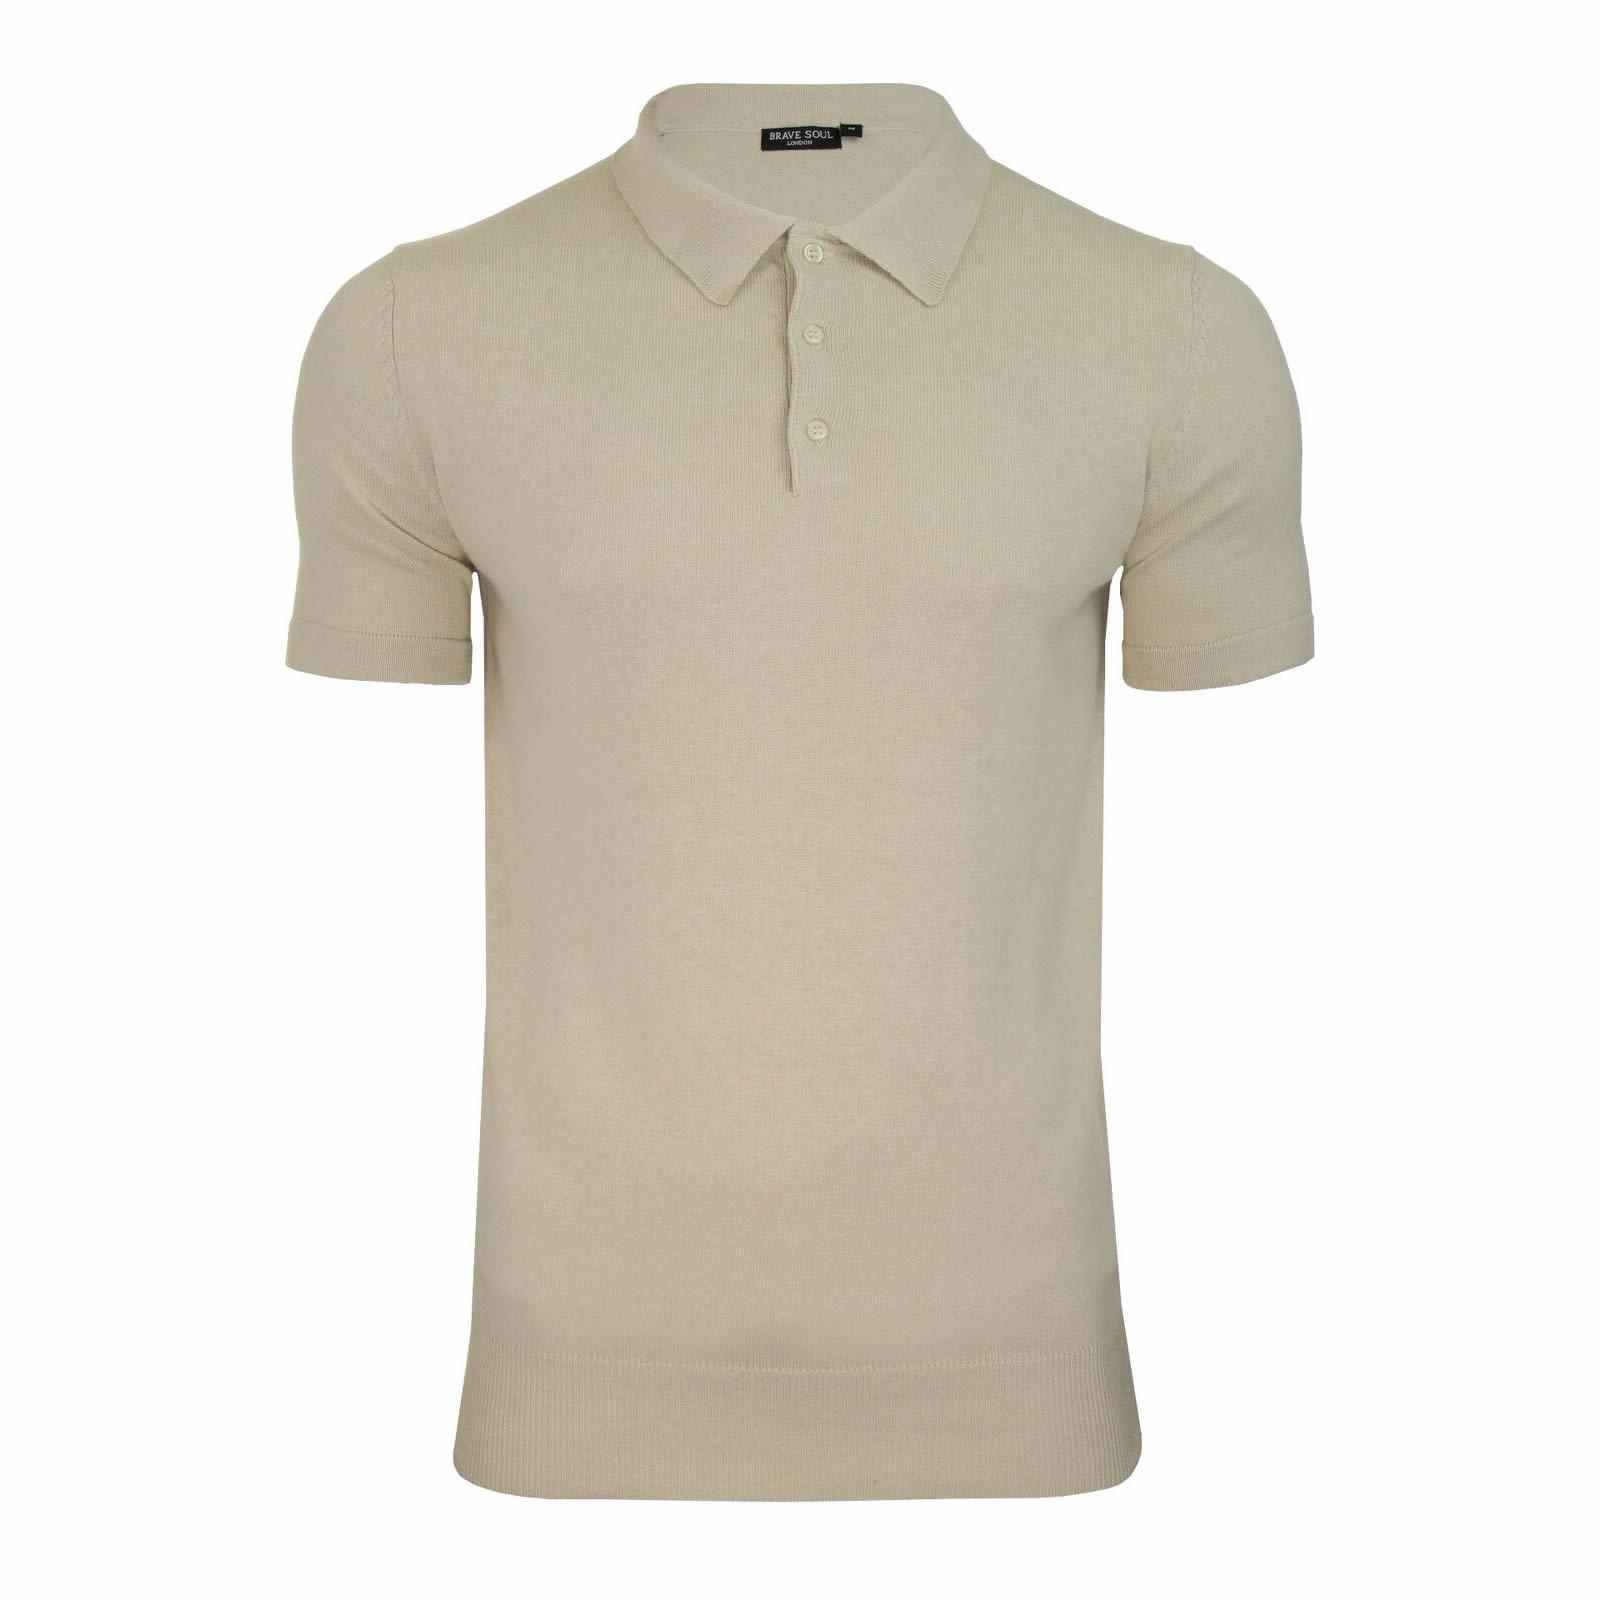 Mens-Knitted-Polo-Brave-Soul-Columbus-Collared-Short-Sleeve-Jumper-T-Shirt thumbnail 8